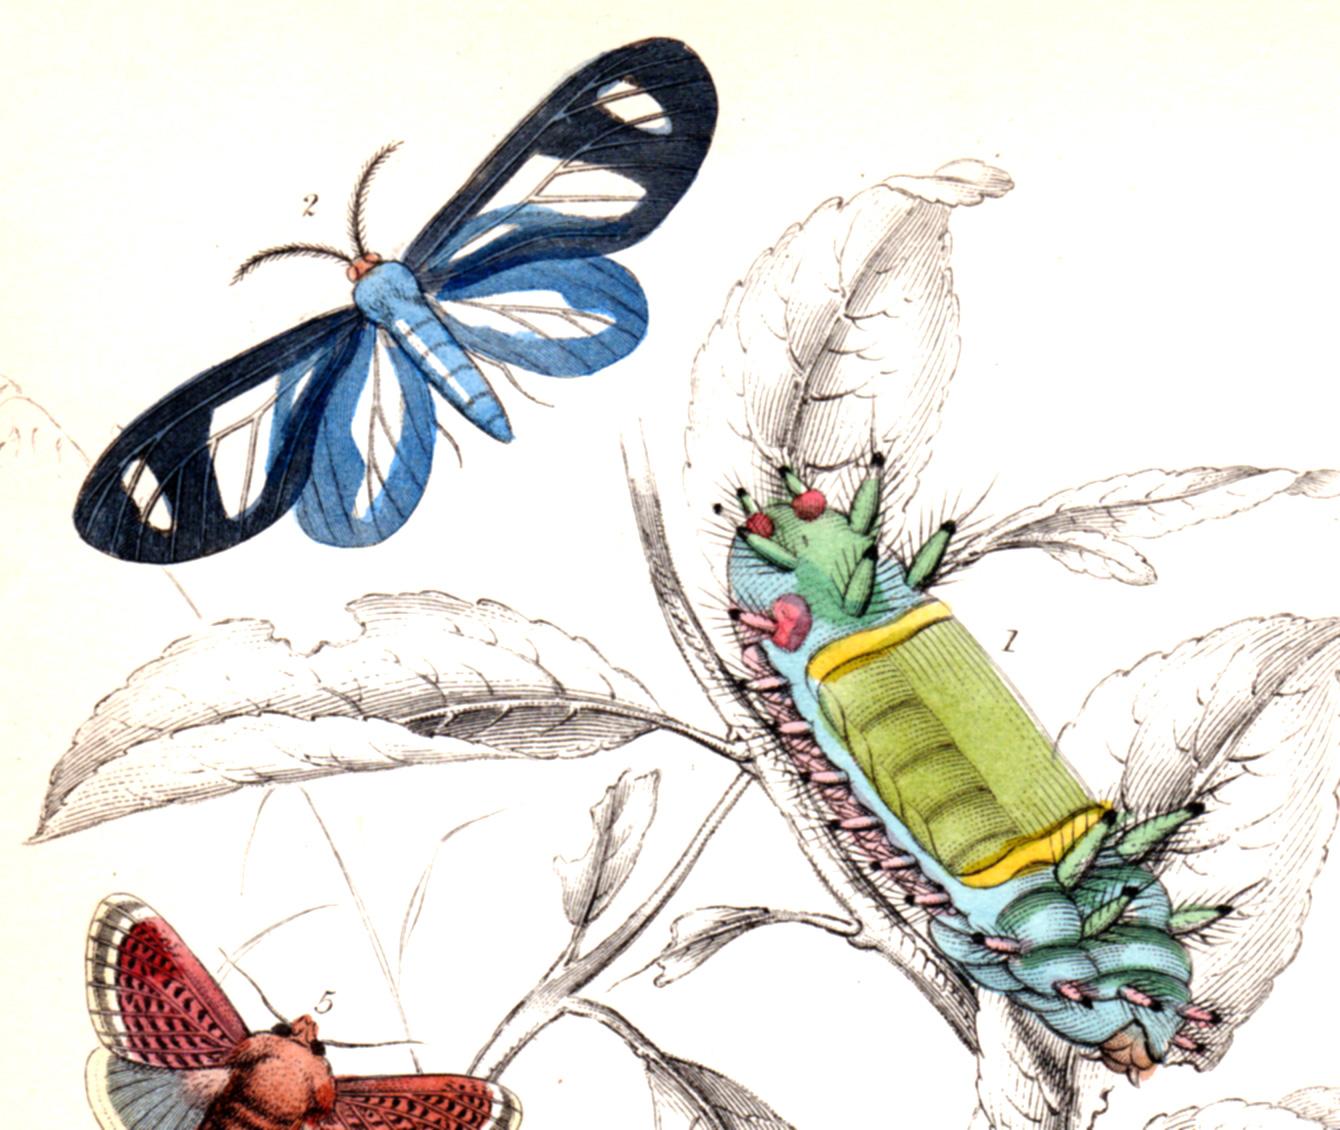 Jardine, Sir Wm / Lizars, Wm – Butterflies, caterpillars, etc.